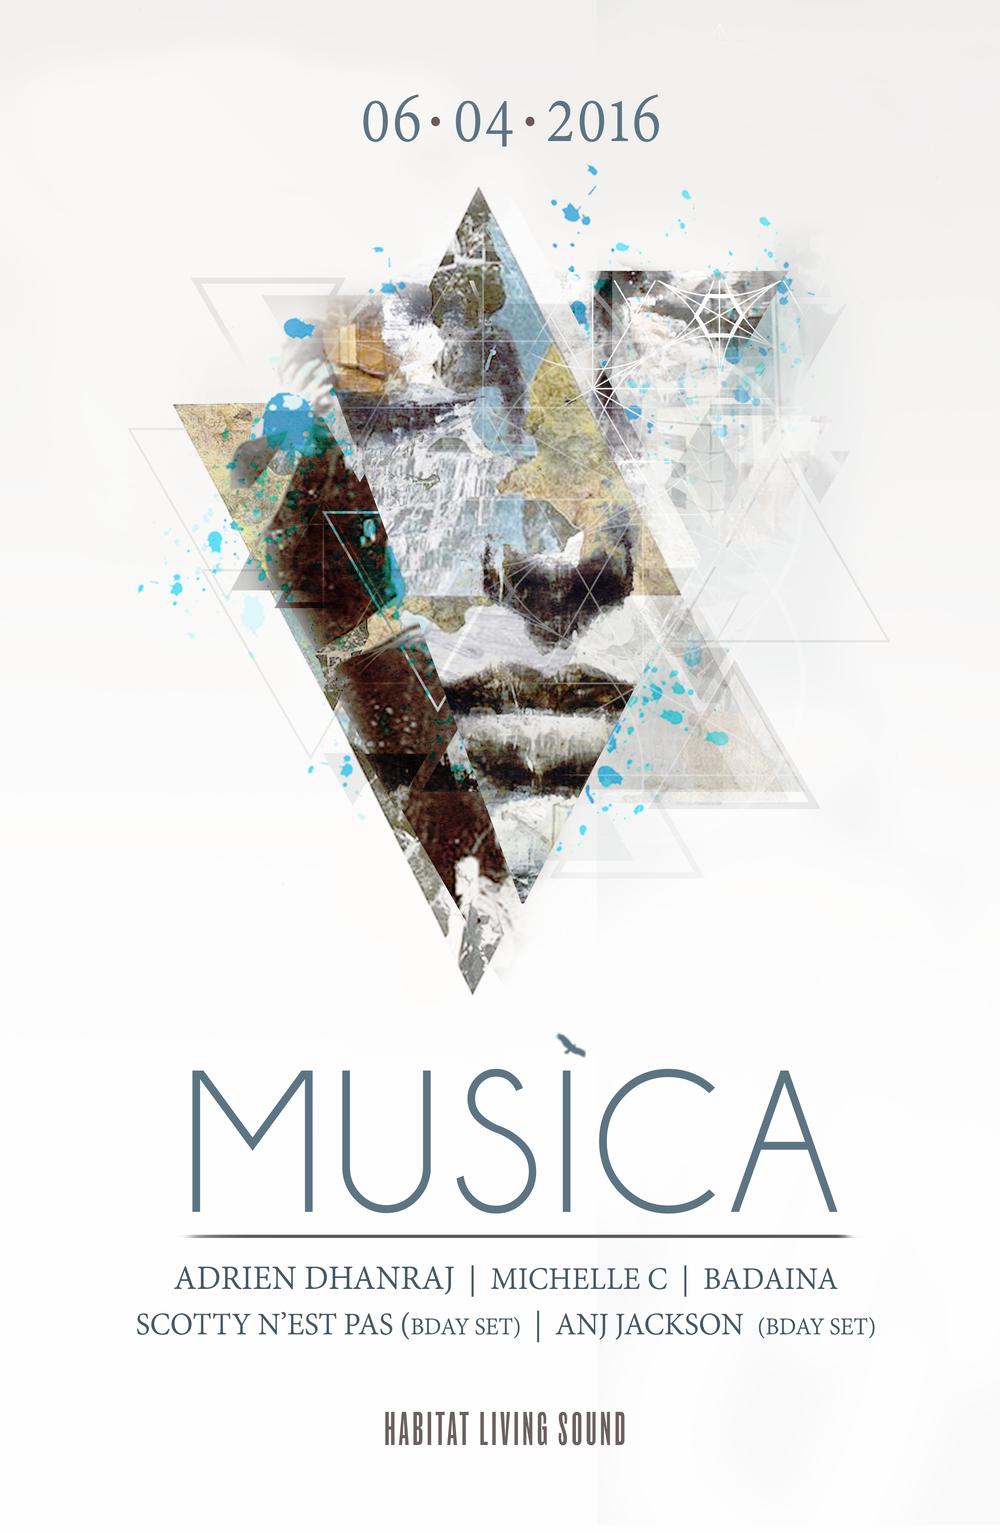 musica-habitat-living-sound.jpeg